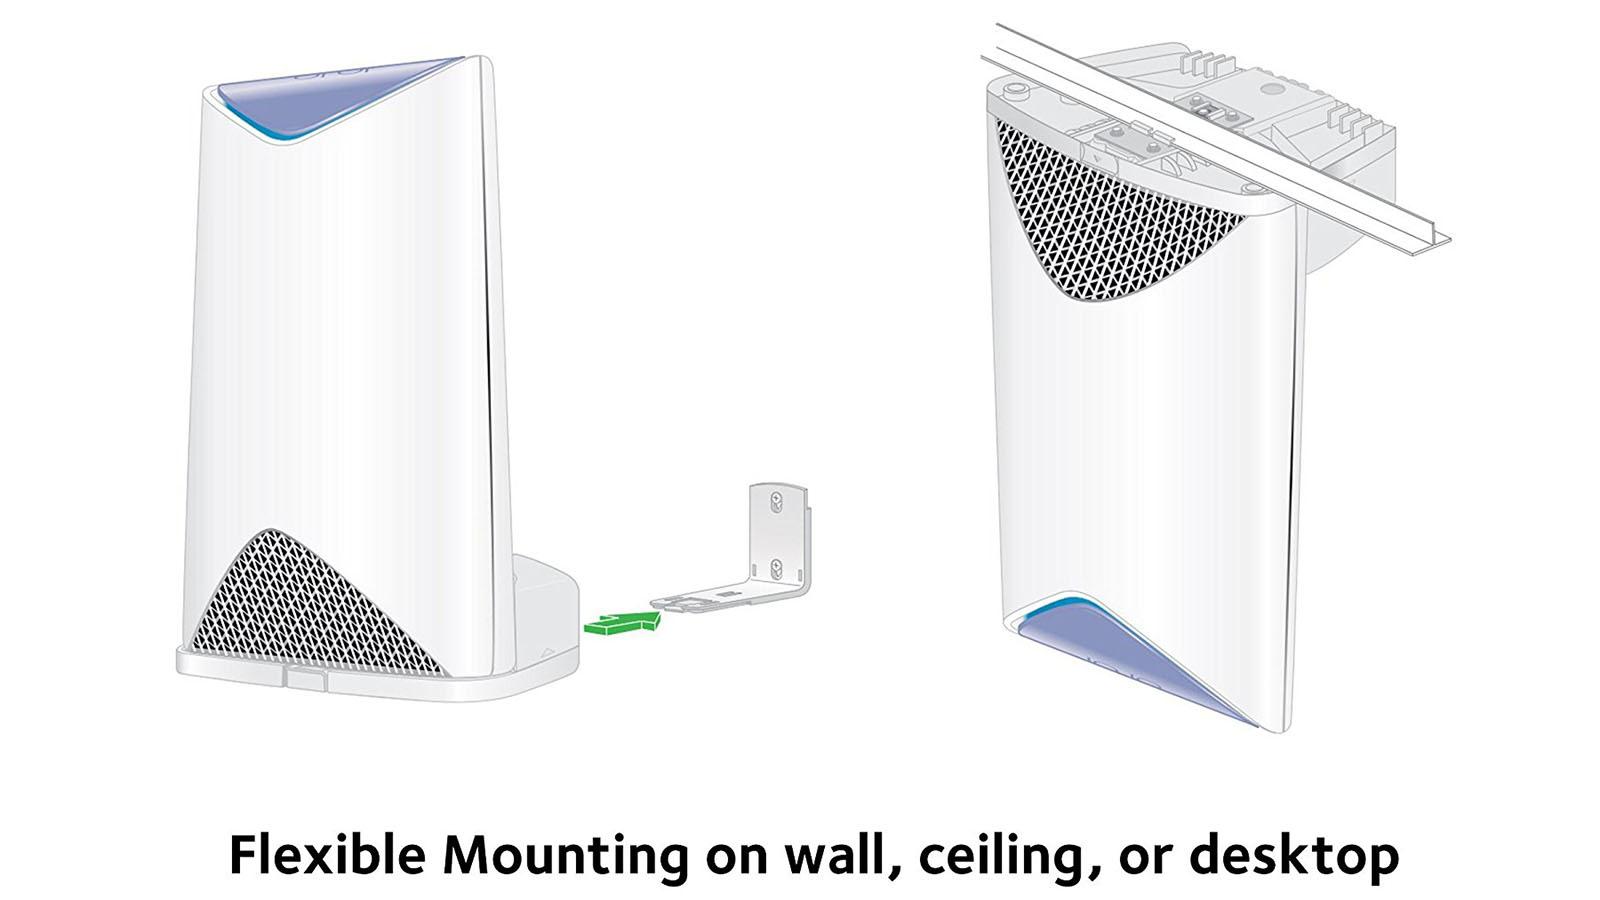 Netgear Orbi Pro mounting